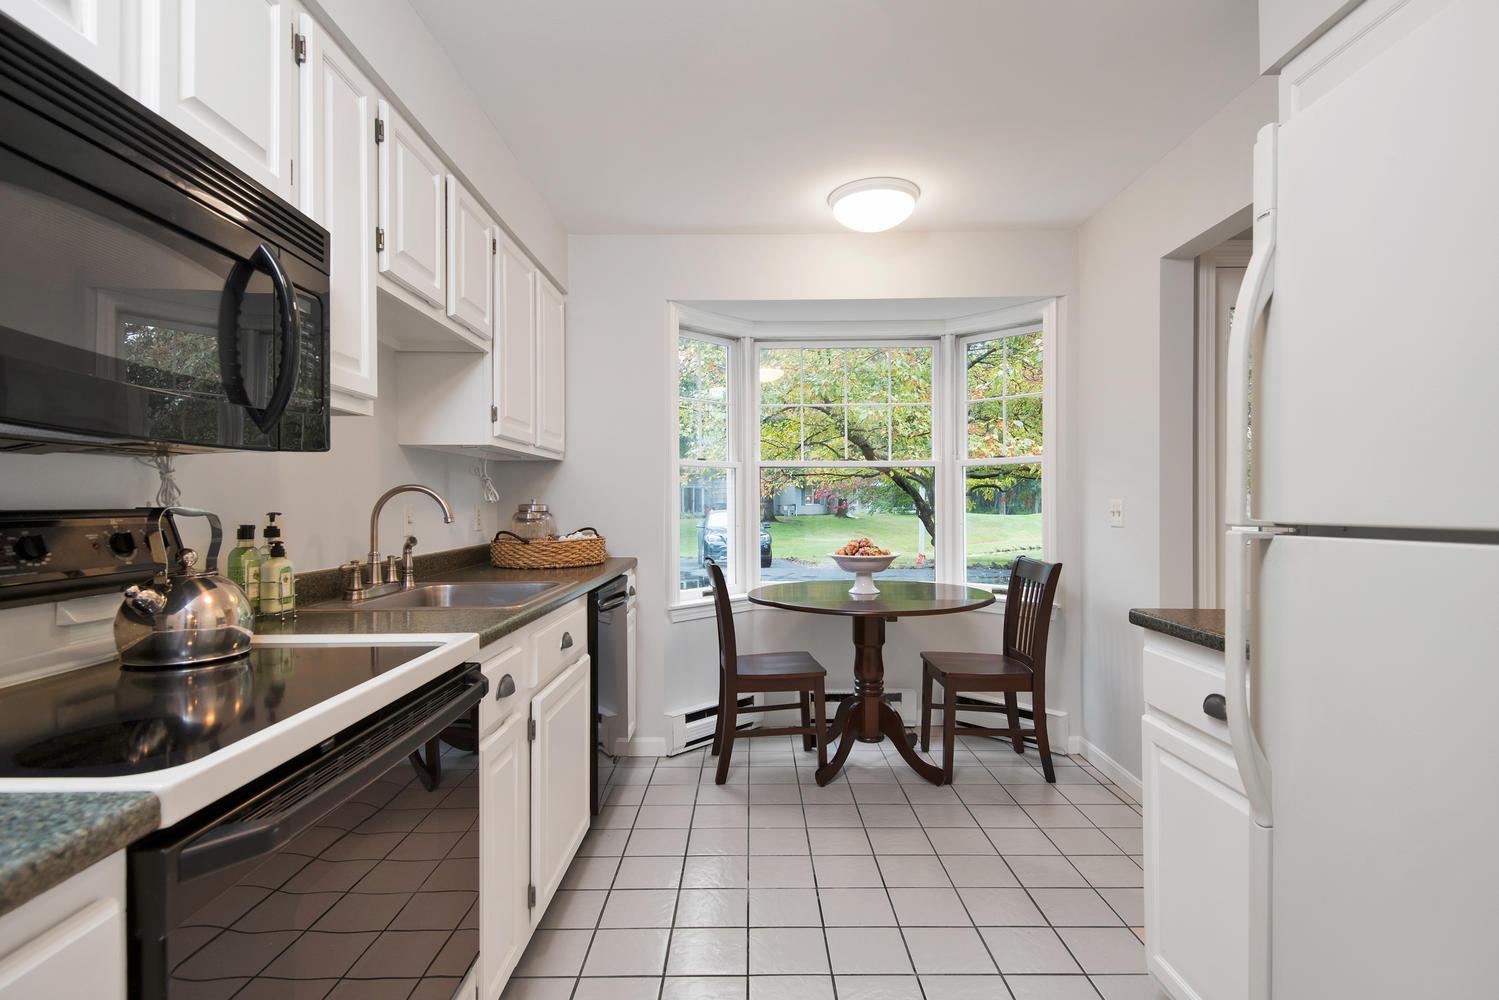 11 Crestfield Terrace Portland-large-013-4-Kitchen-1499x1000-72dpi_1.jpg